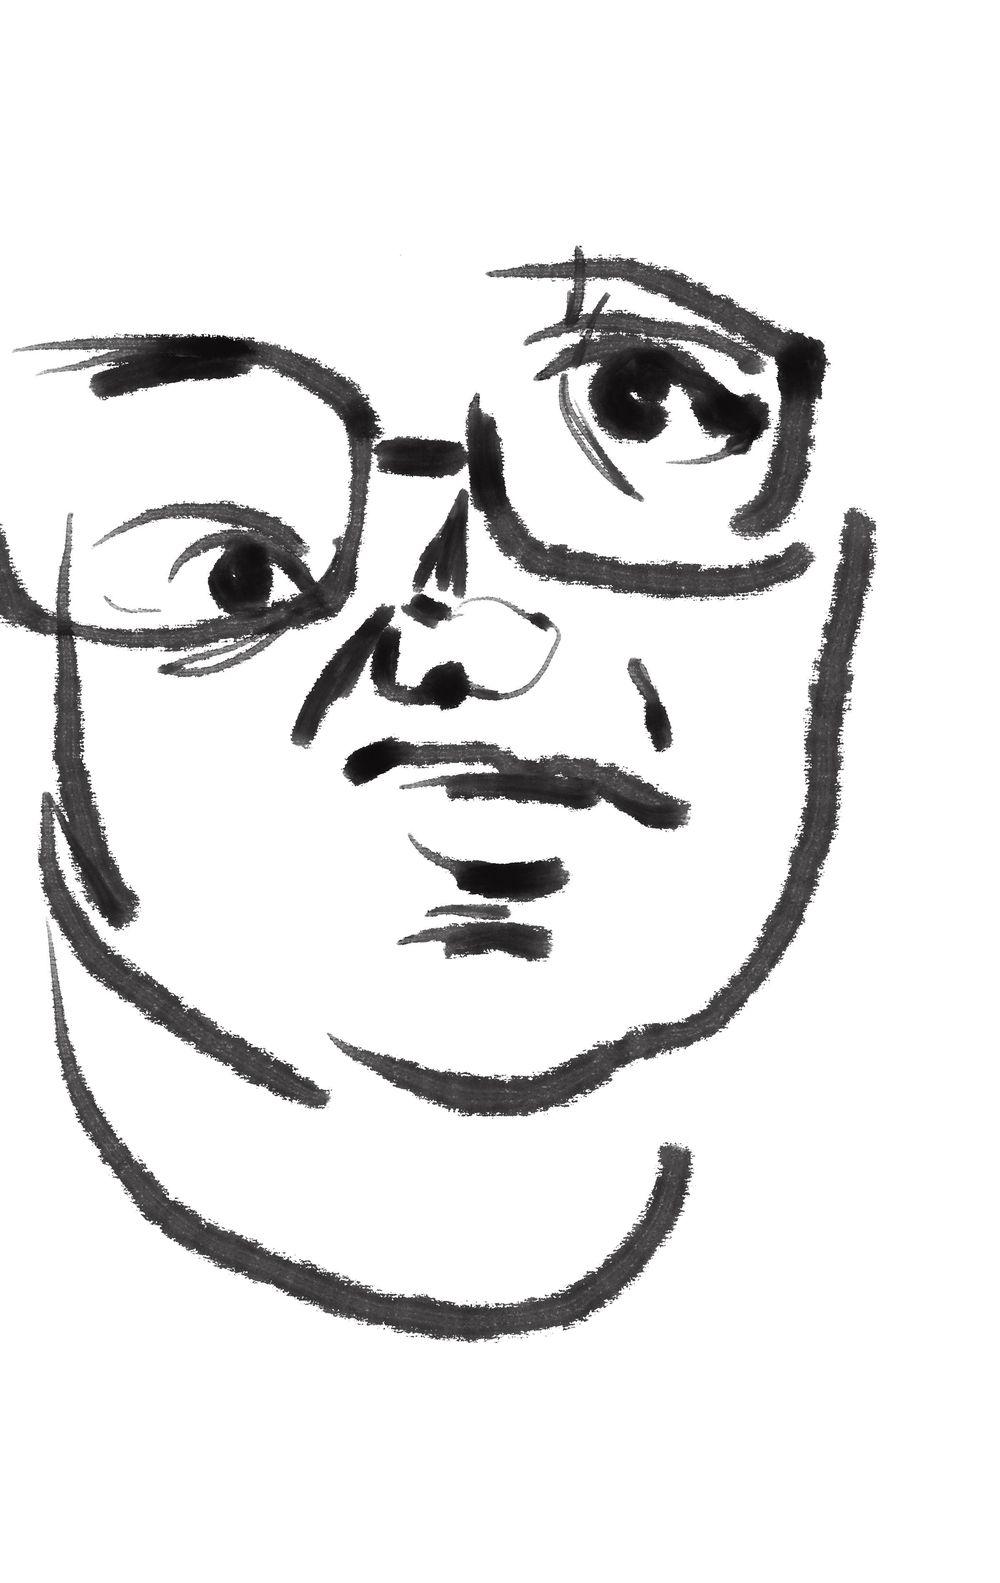 Self Portraits - image 4 - student project